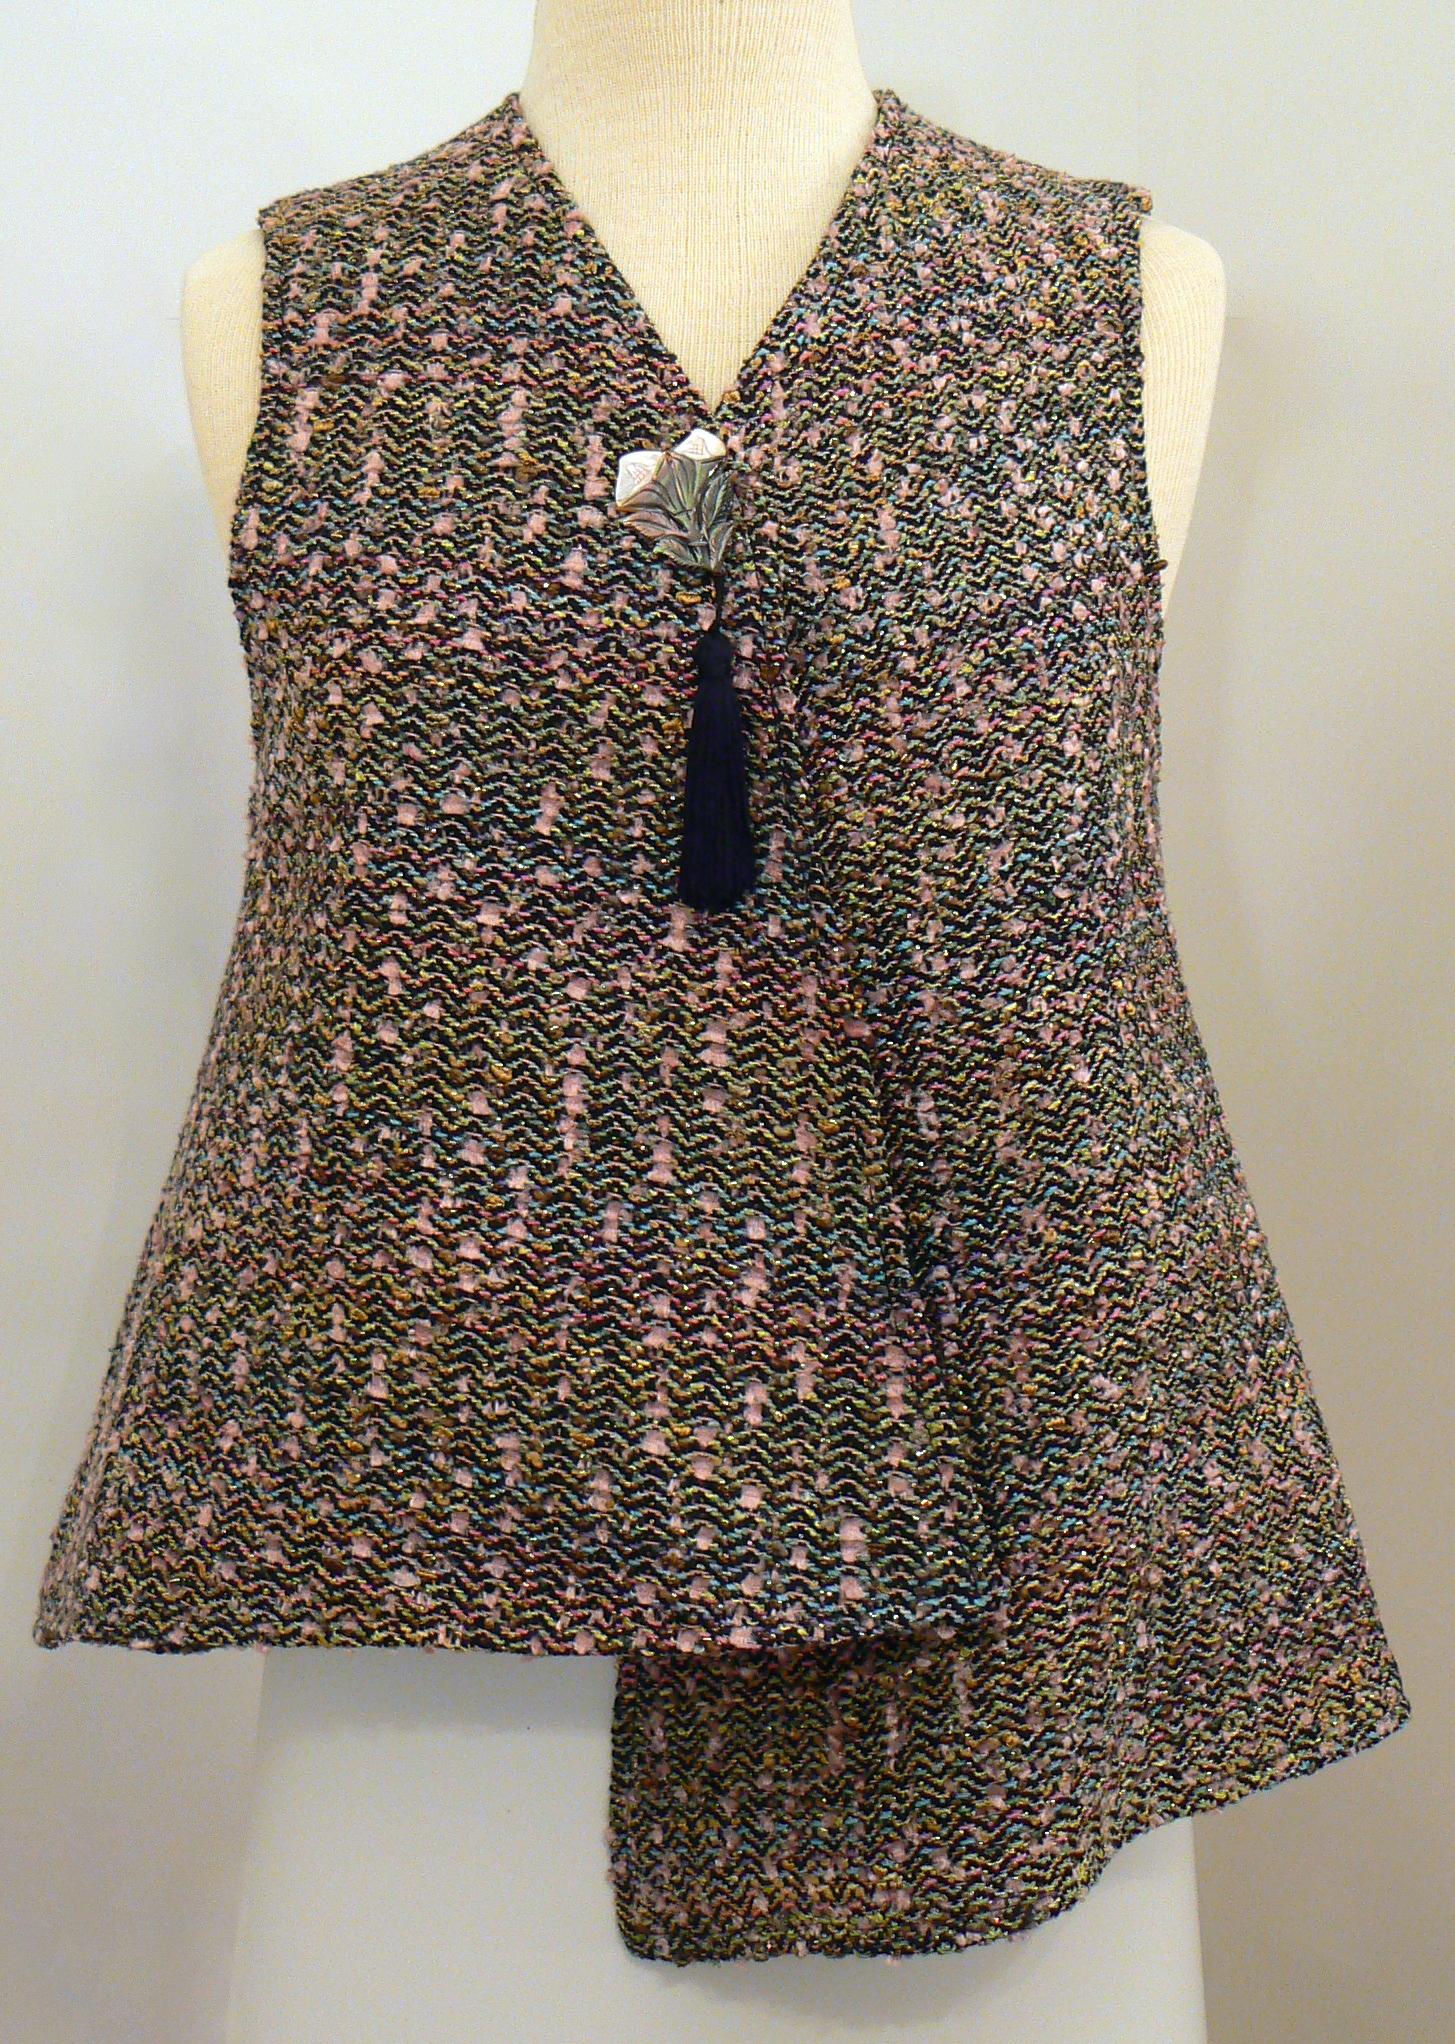 Handwoven Clothing, Vest, Kathleen Weir-West,27-001.JPG